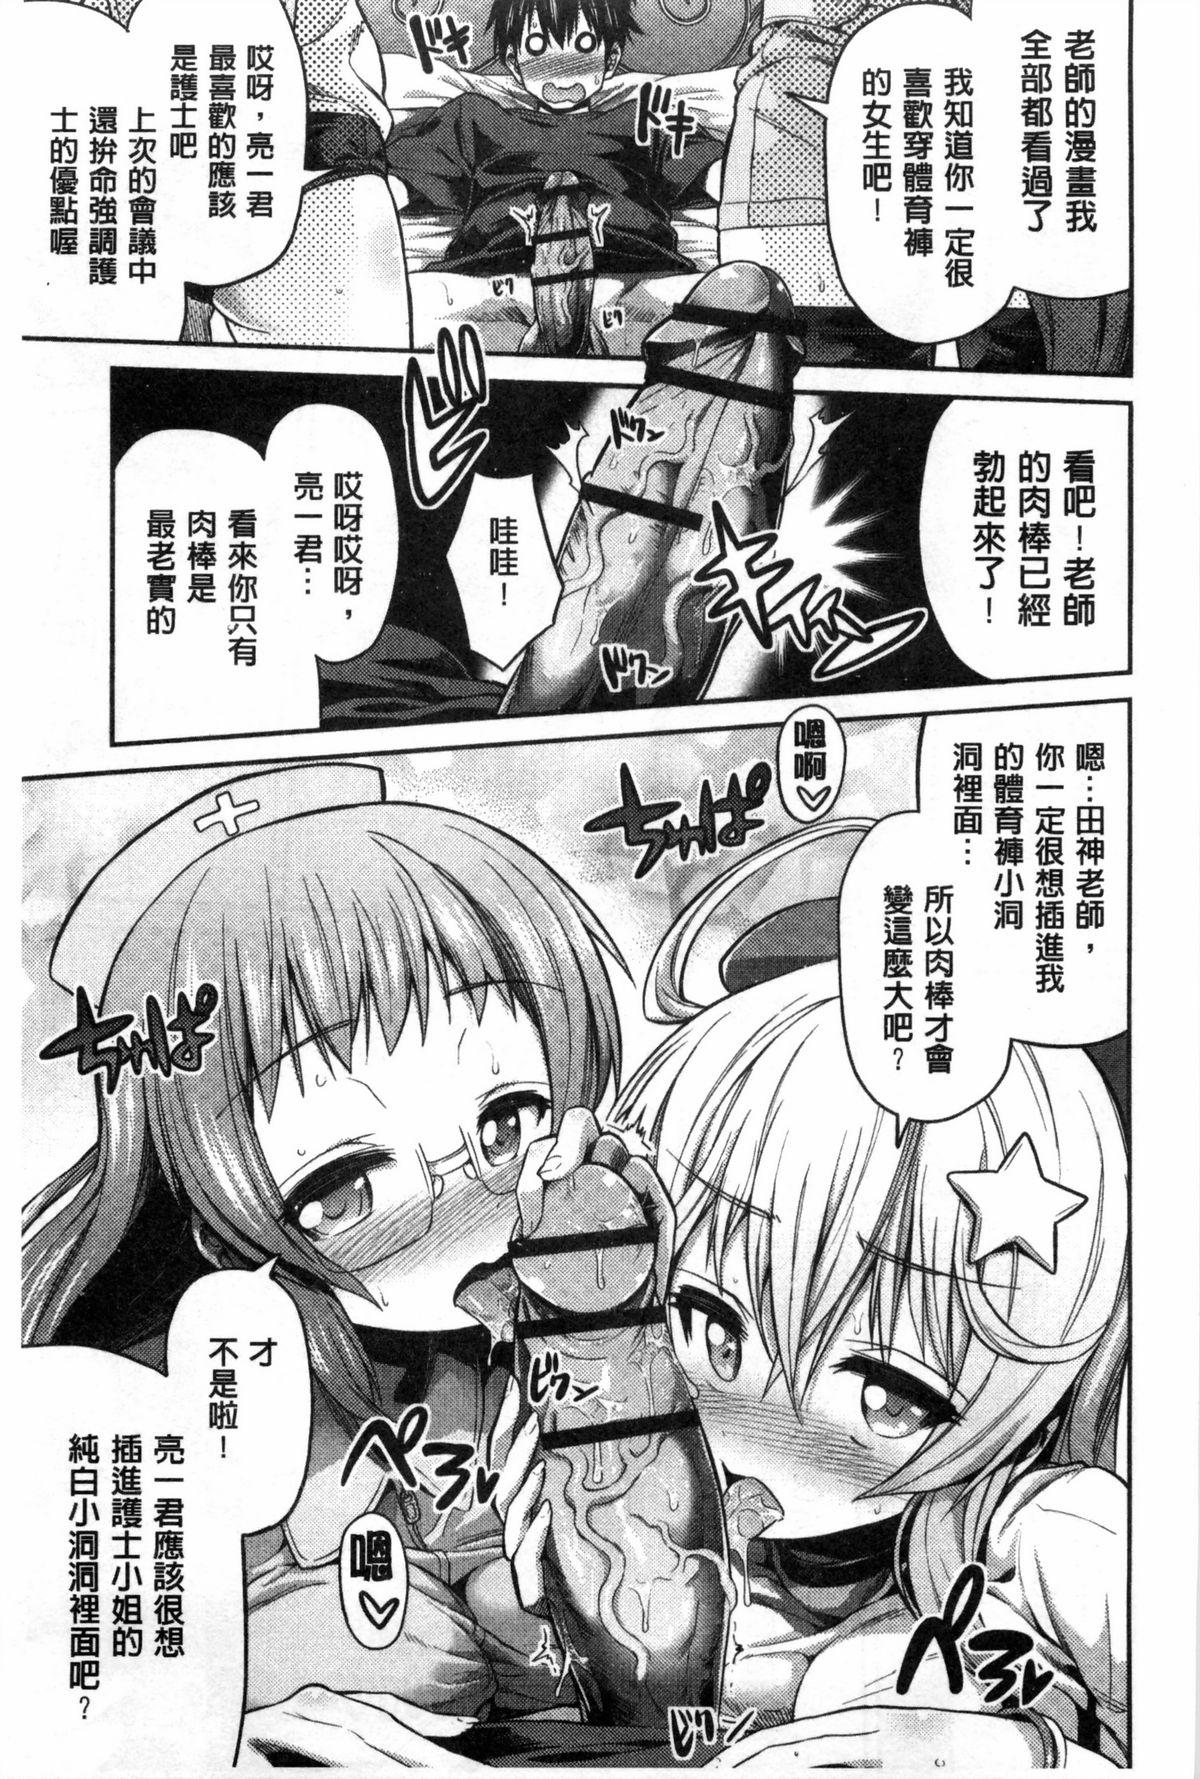 Man x Koi - Ero Manga de Hajimaru Koi no Plot   A漫×戀情 由情色漫畫所萌生的戀之物語 57